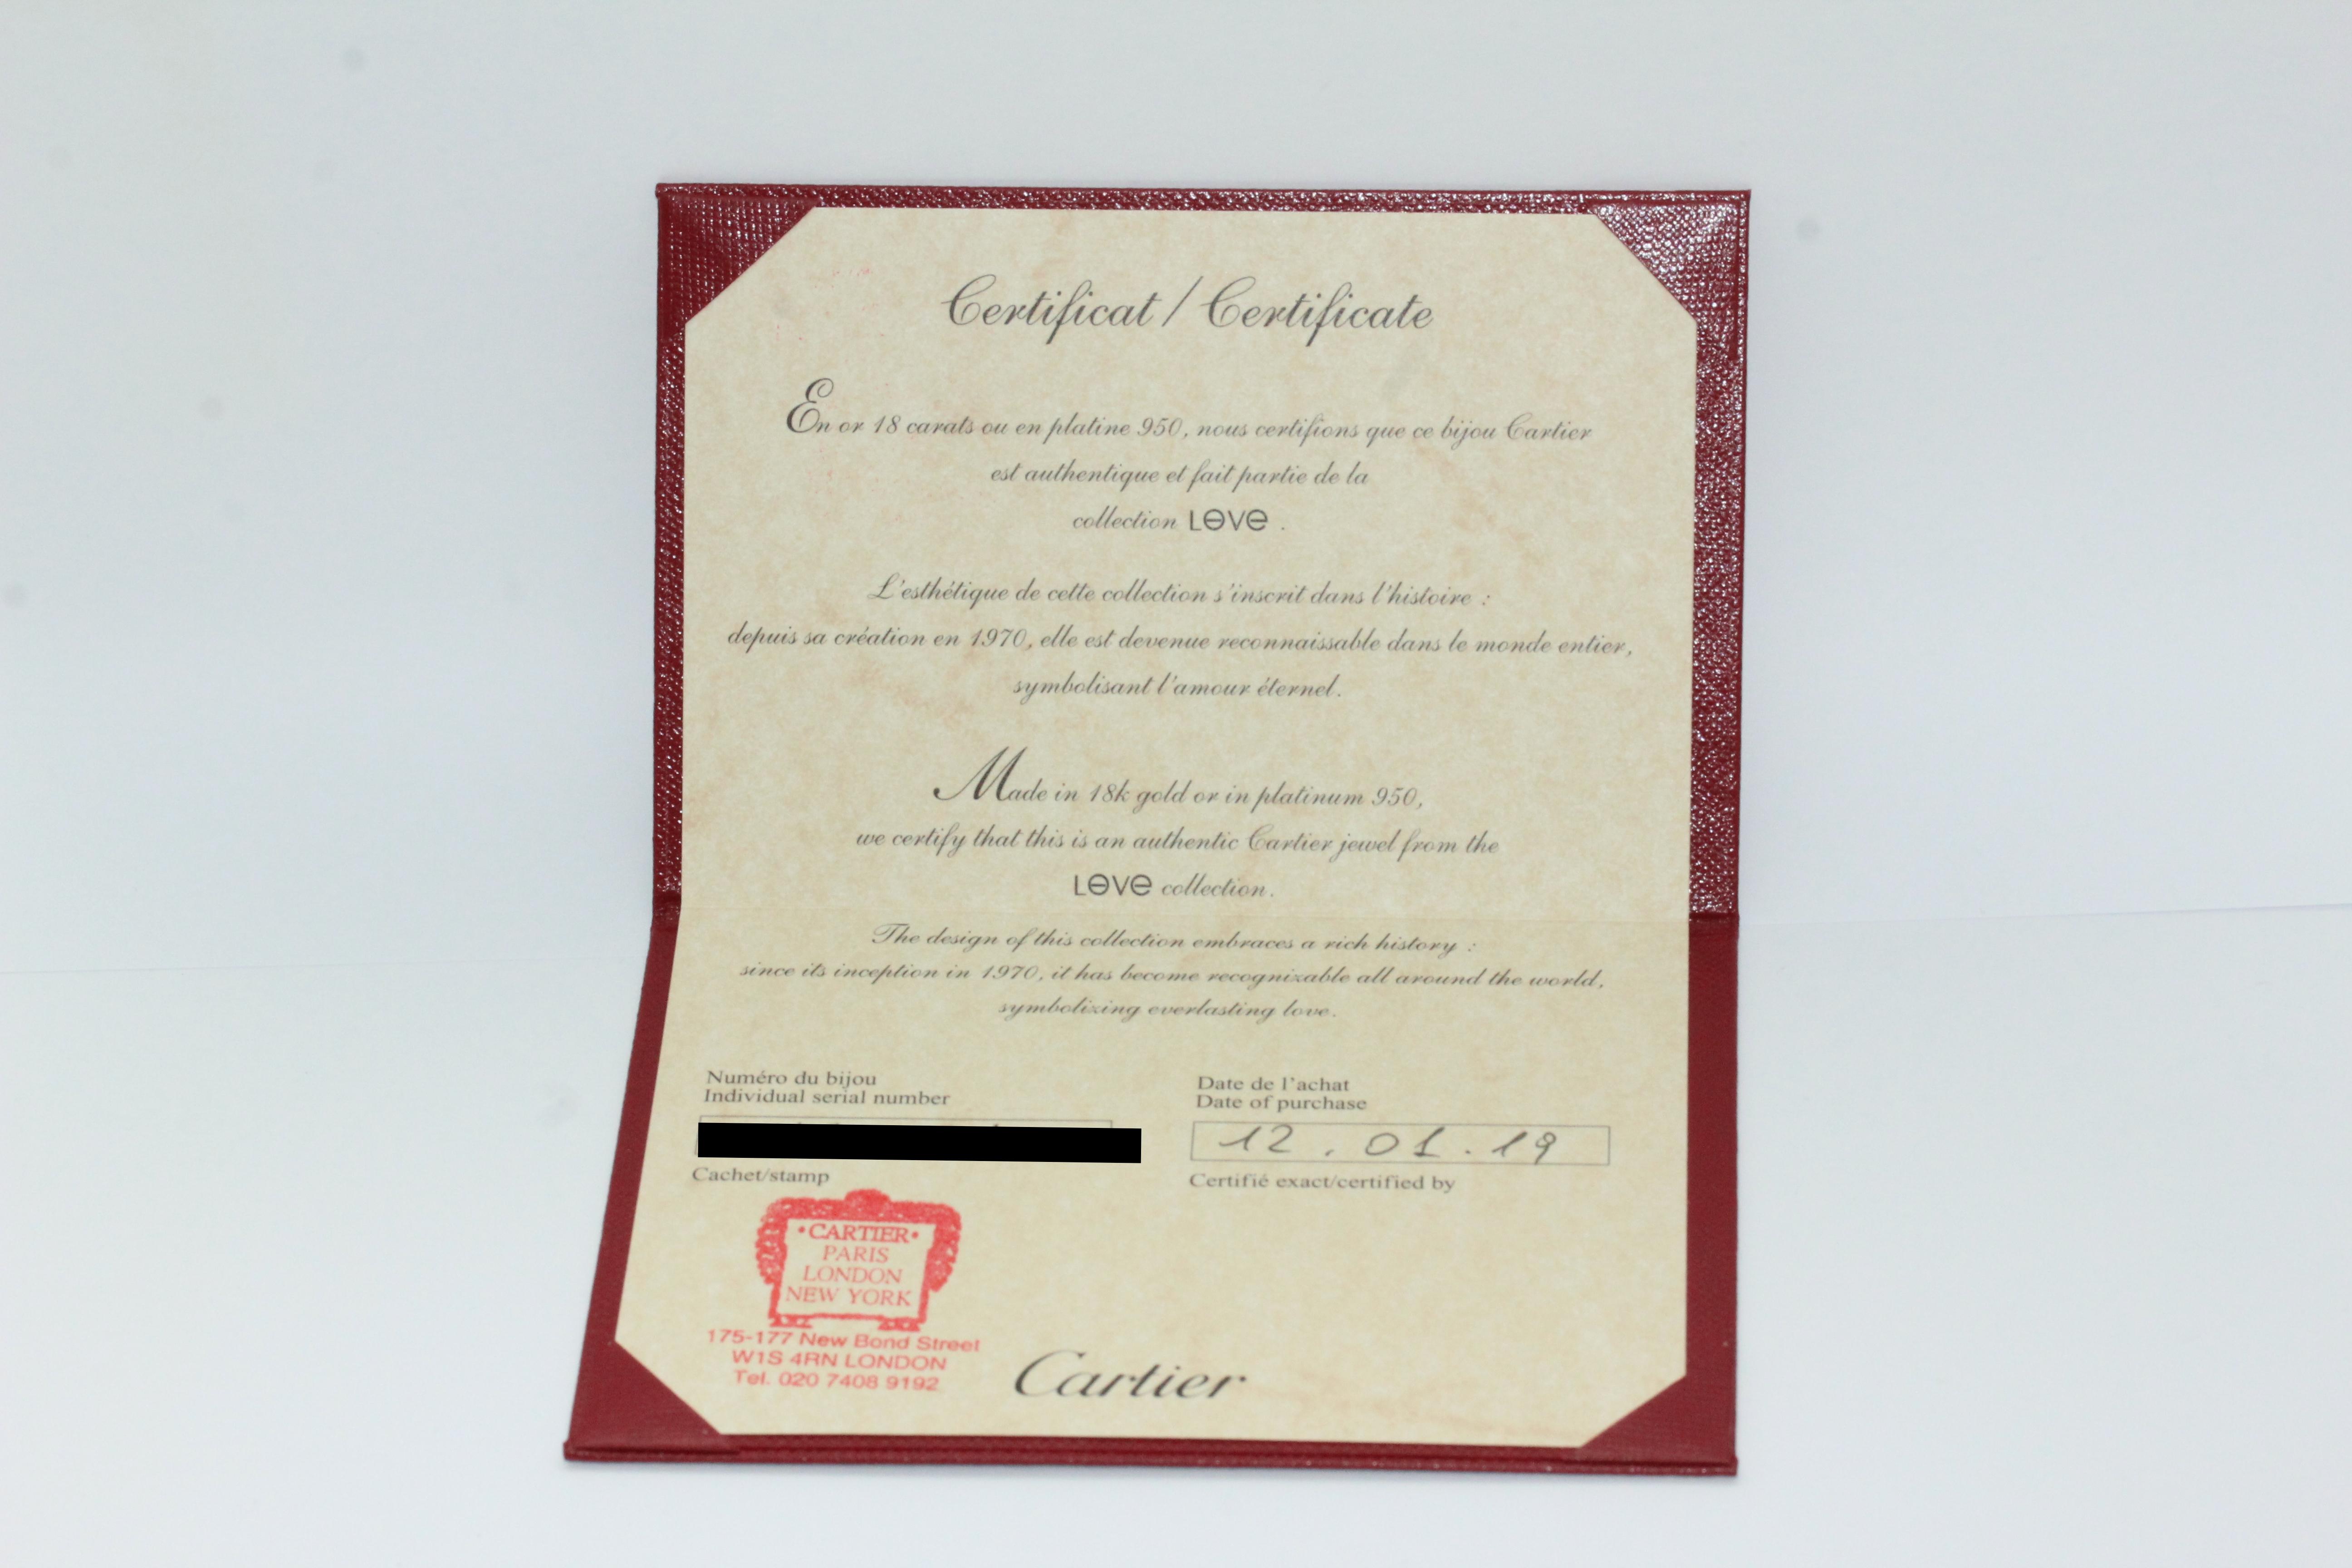 b06325c9f Home / Bangles / Bangles / Cartier LOVE Bangle Bracelet Size 16